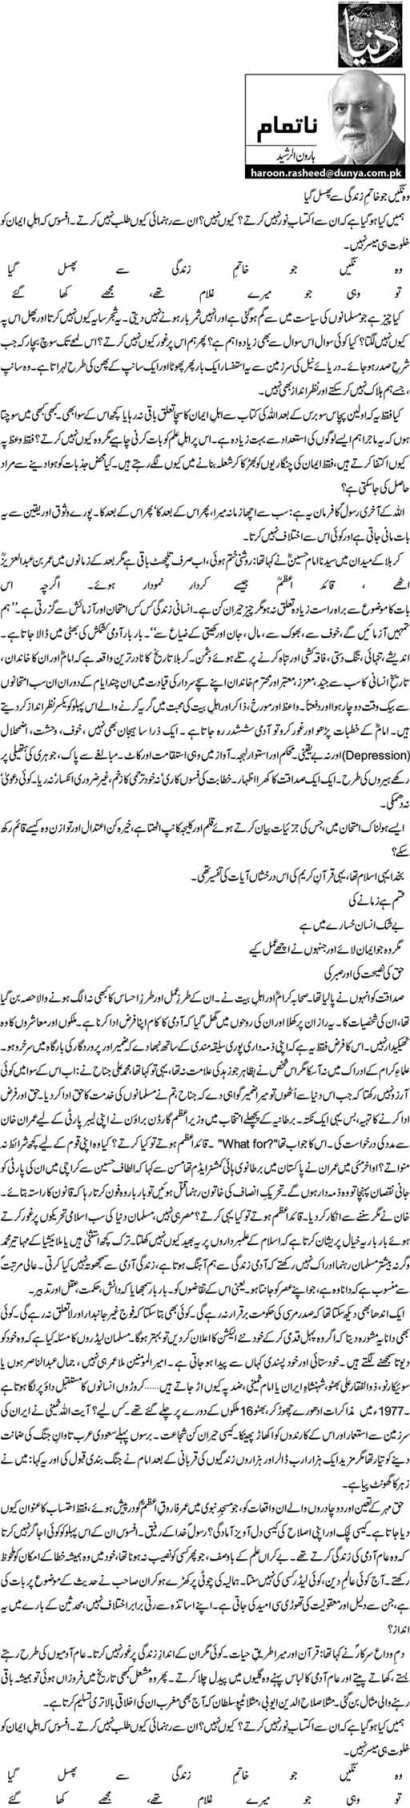 Woh Nageen Jo Khatim e Zindagi Se Phisal Gaya - Haroon-ur-Rasheed